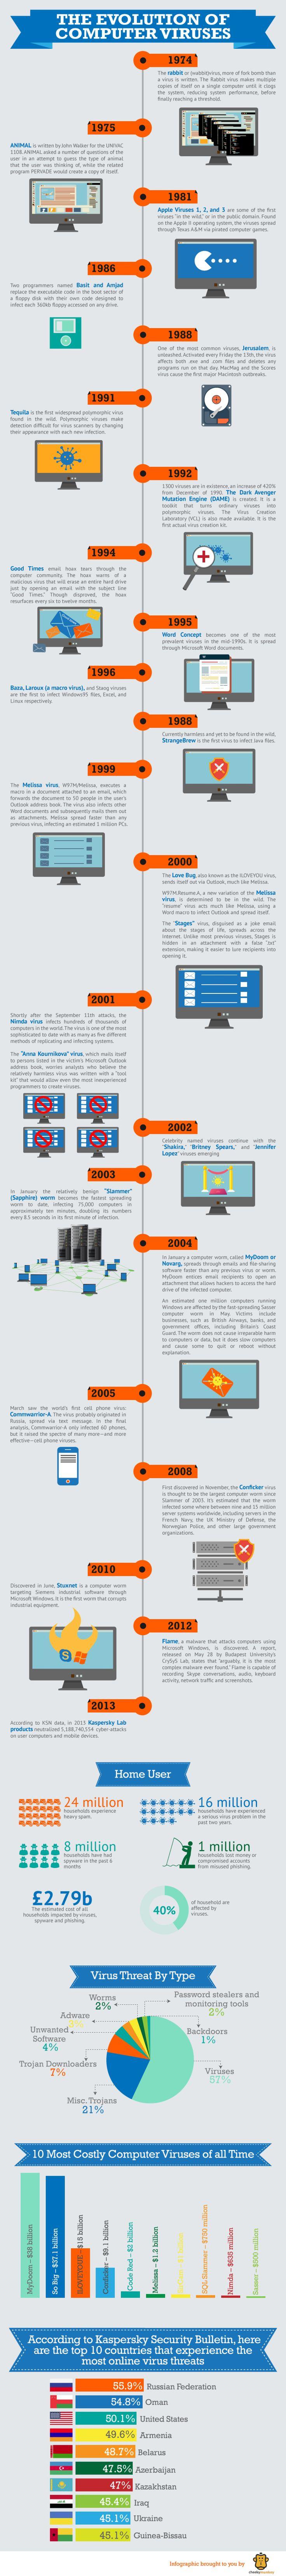 The Evolution of Computer Viruses #Infographic #ComputerViruses